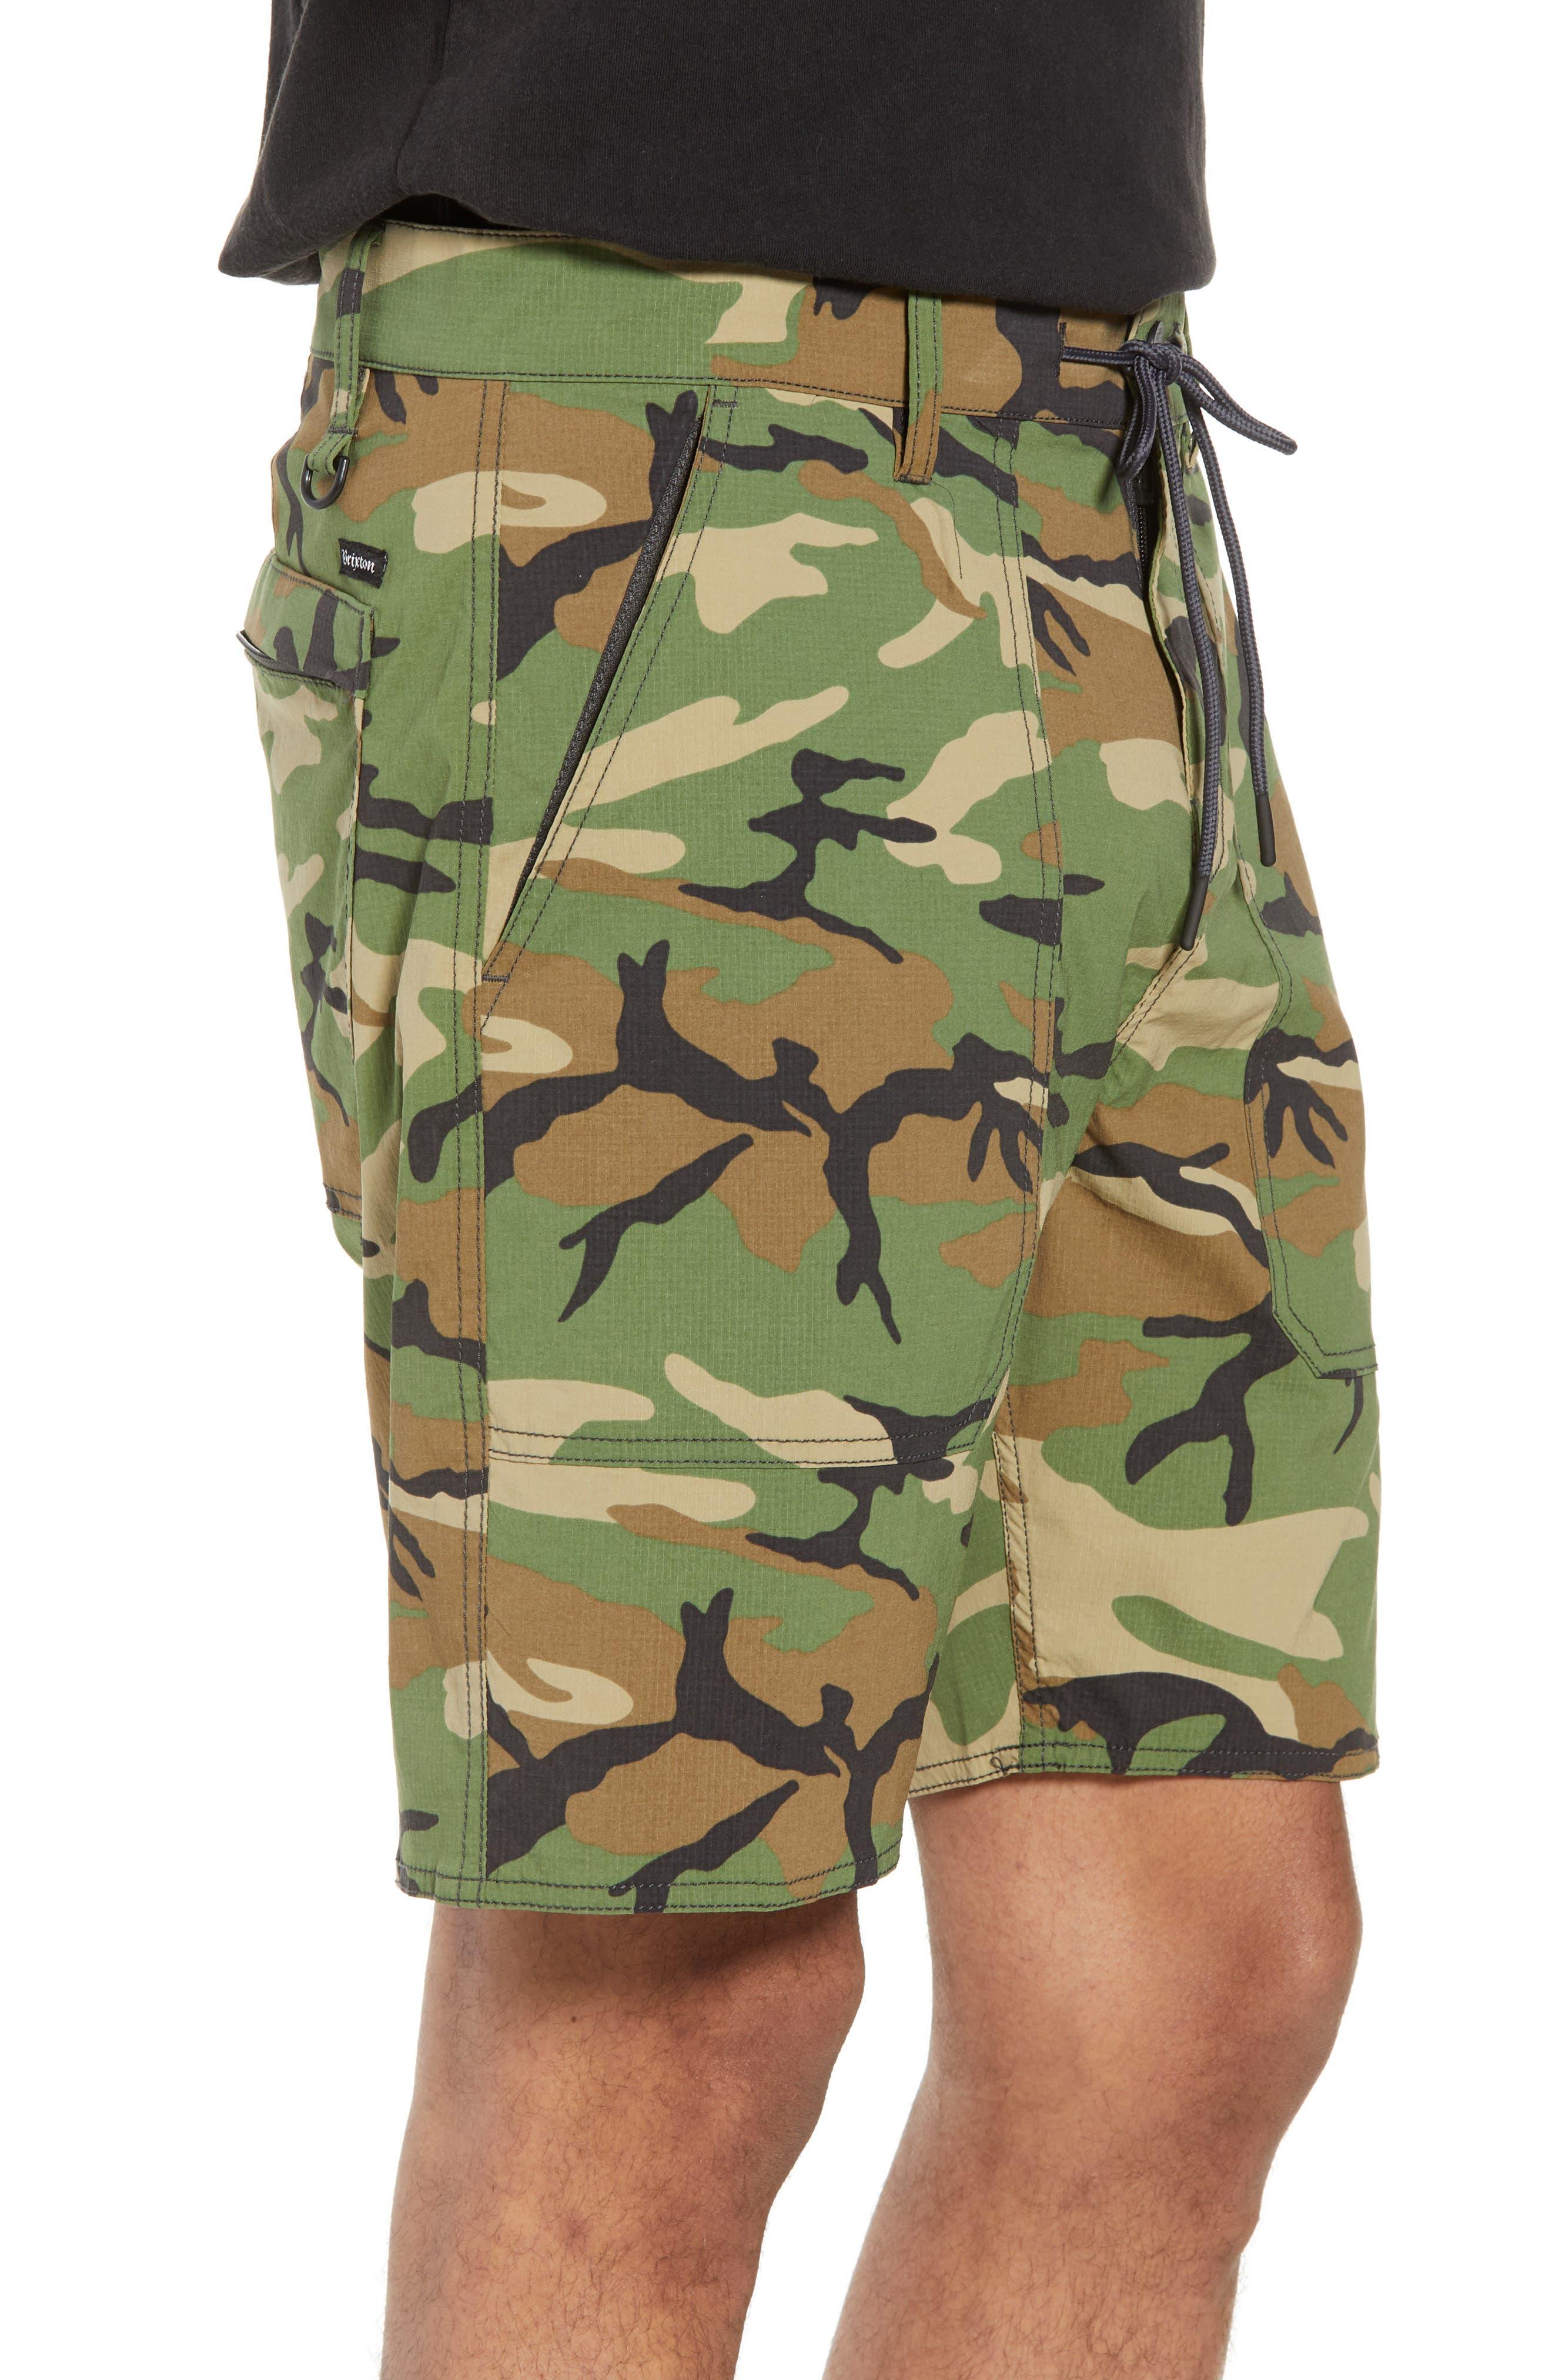 Prospect Service Shorts,                             Alternate thumbnail 3, color,                             Multi Camo